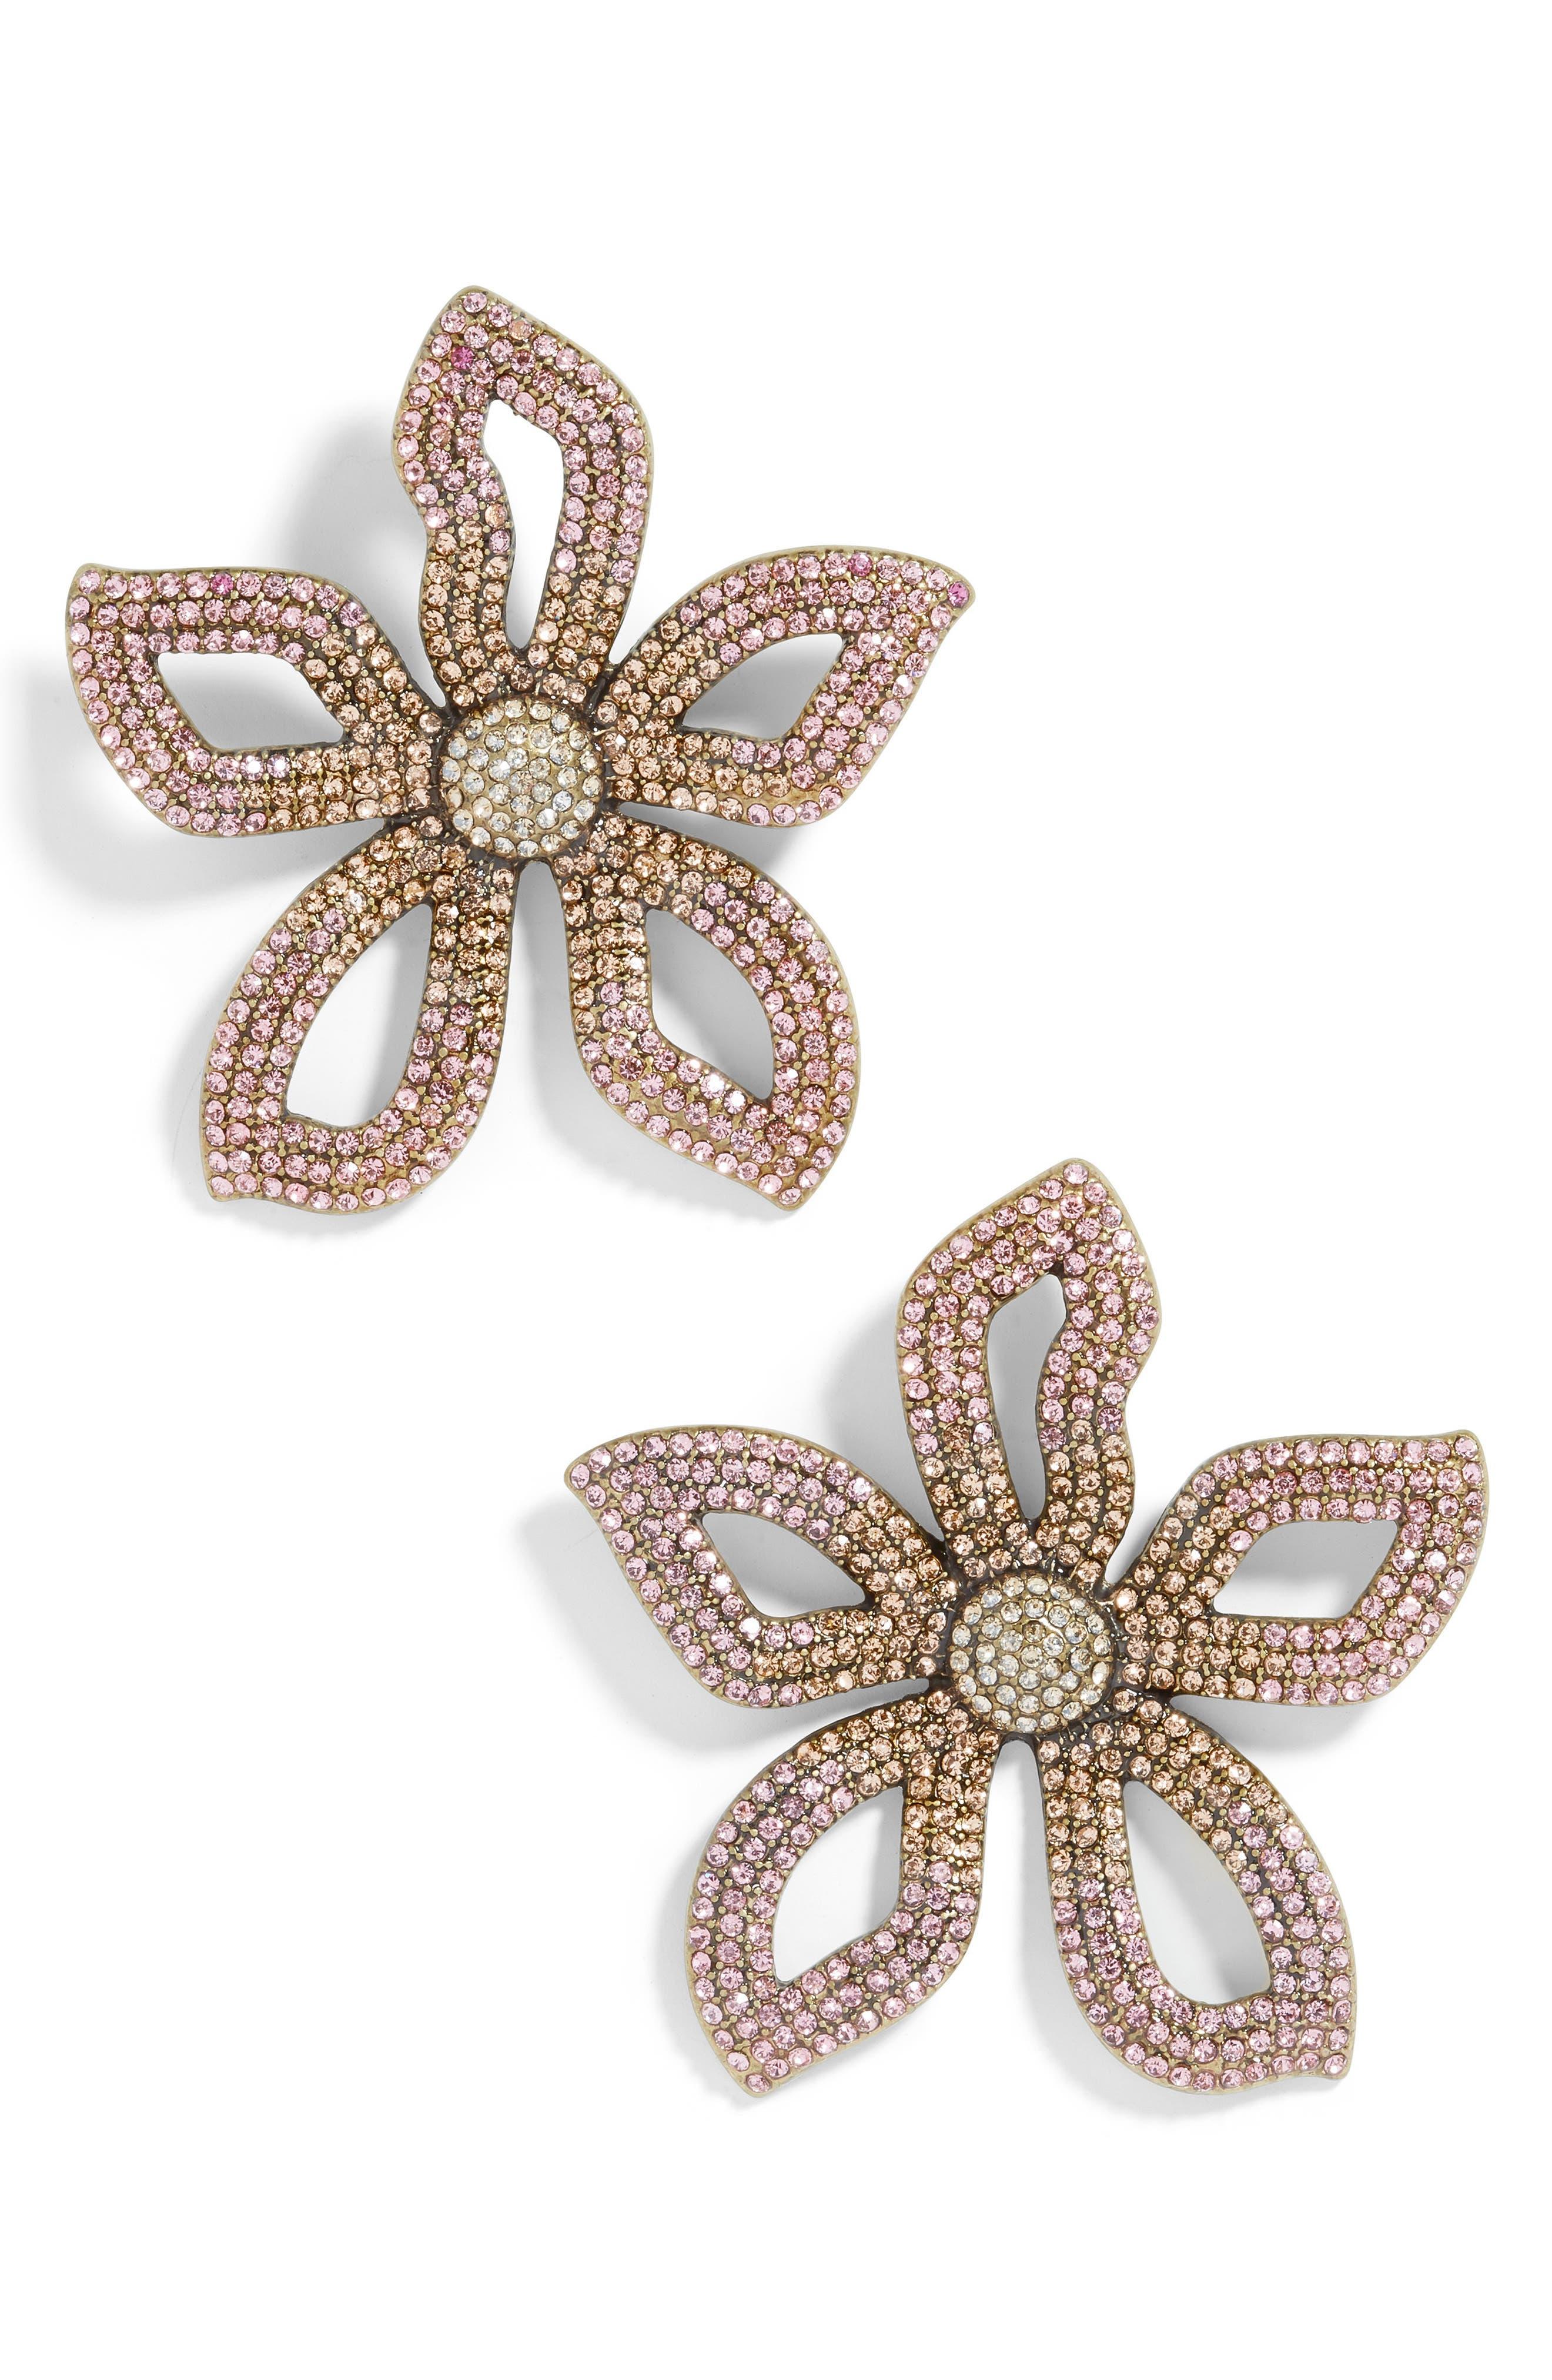 BAUBLEBAR, Primina Flower Drop Earrings, Main thumbnail 1, color, PINK